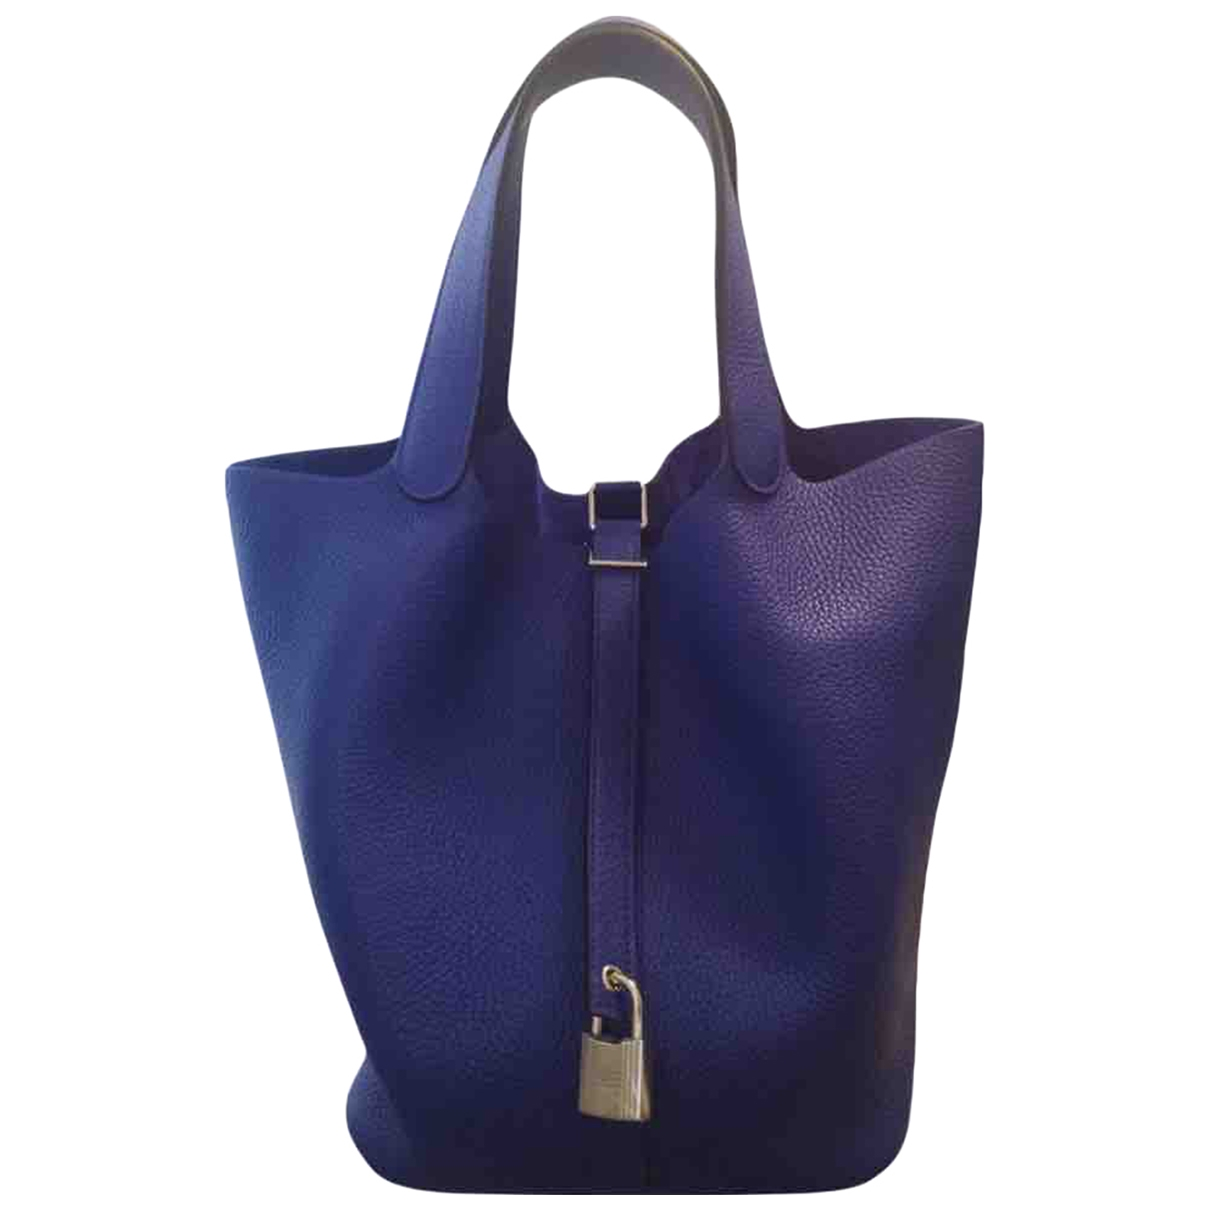 Hermes - Sac a main Picotin pour femme en cuir - bleu